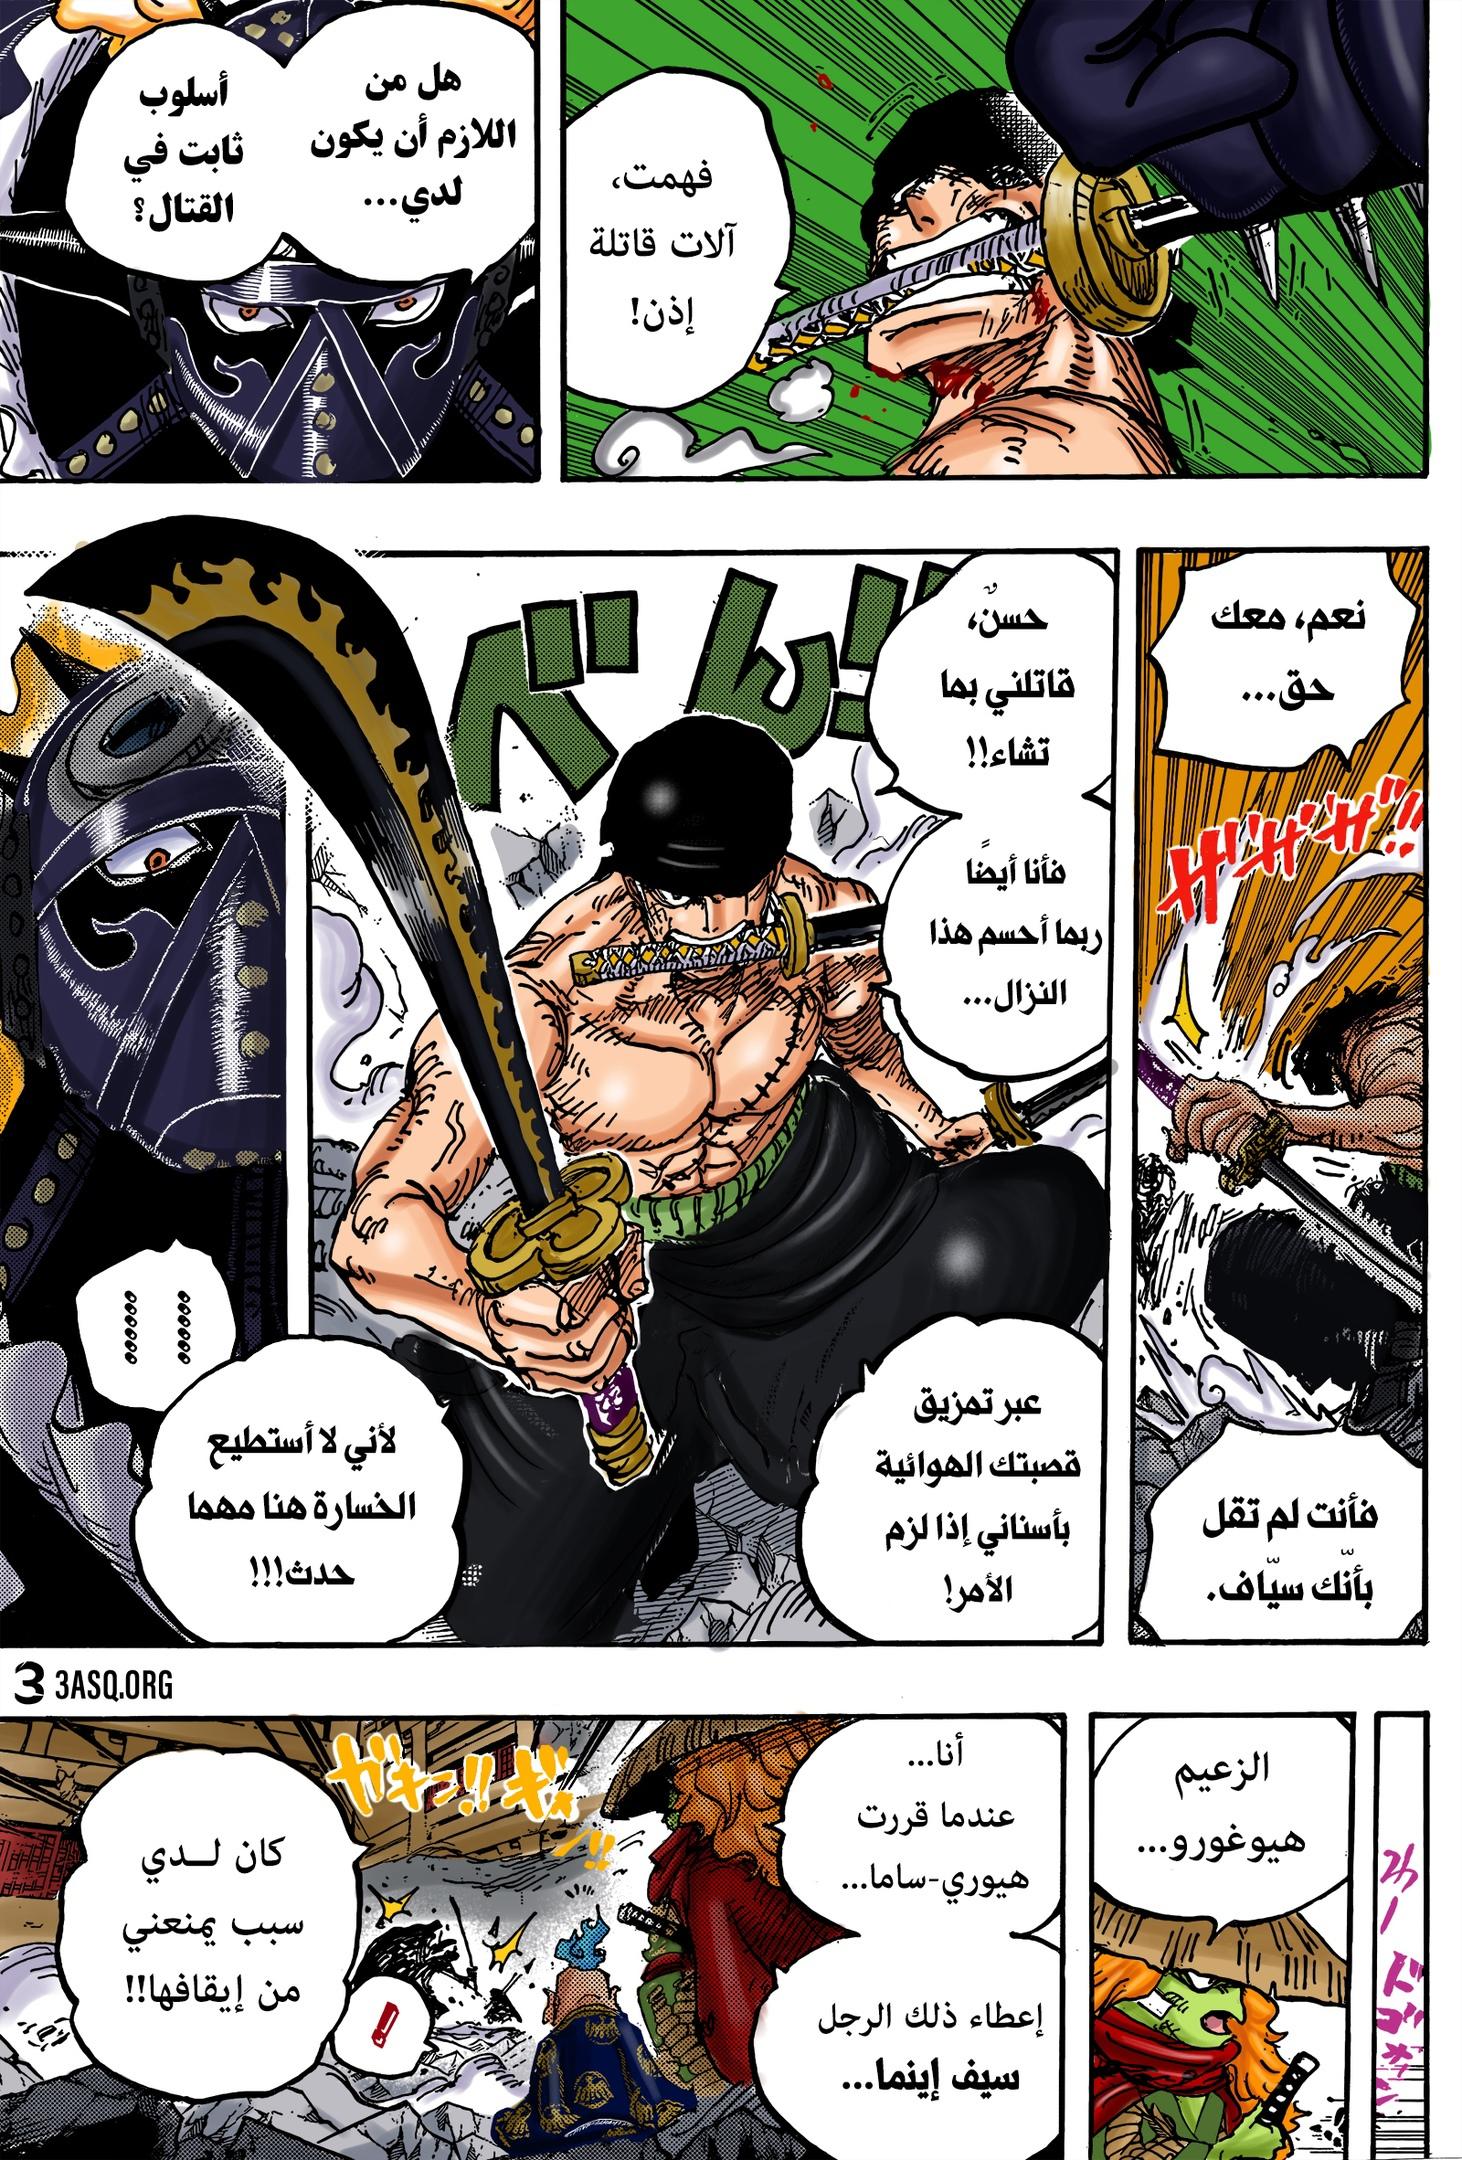 One Piece Arab 1023, image №22